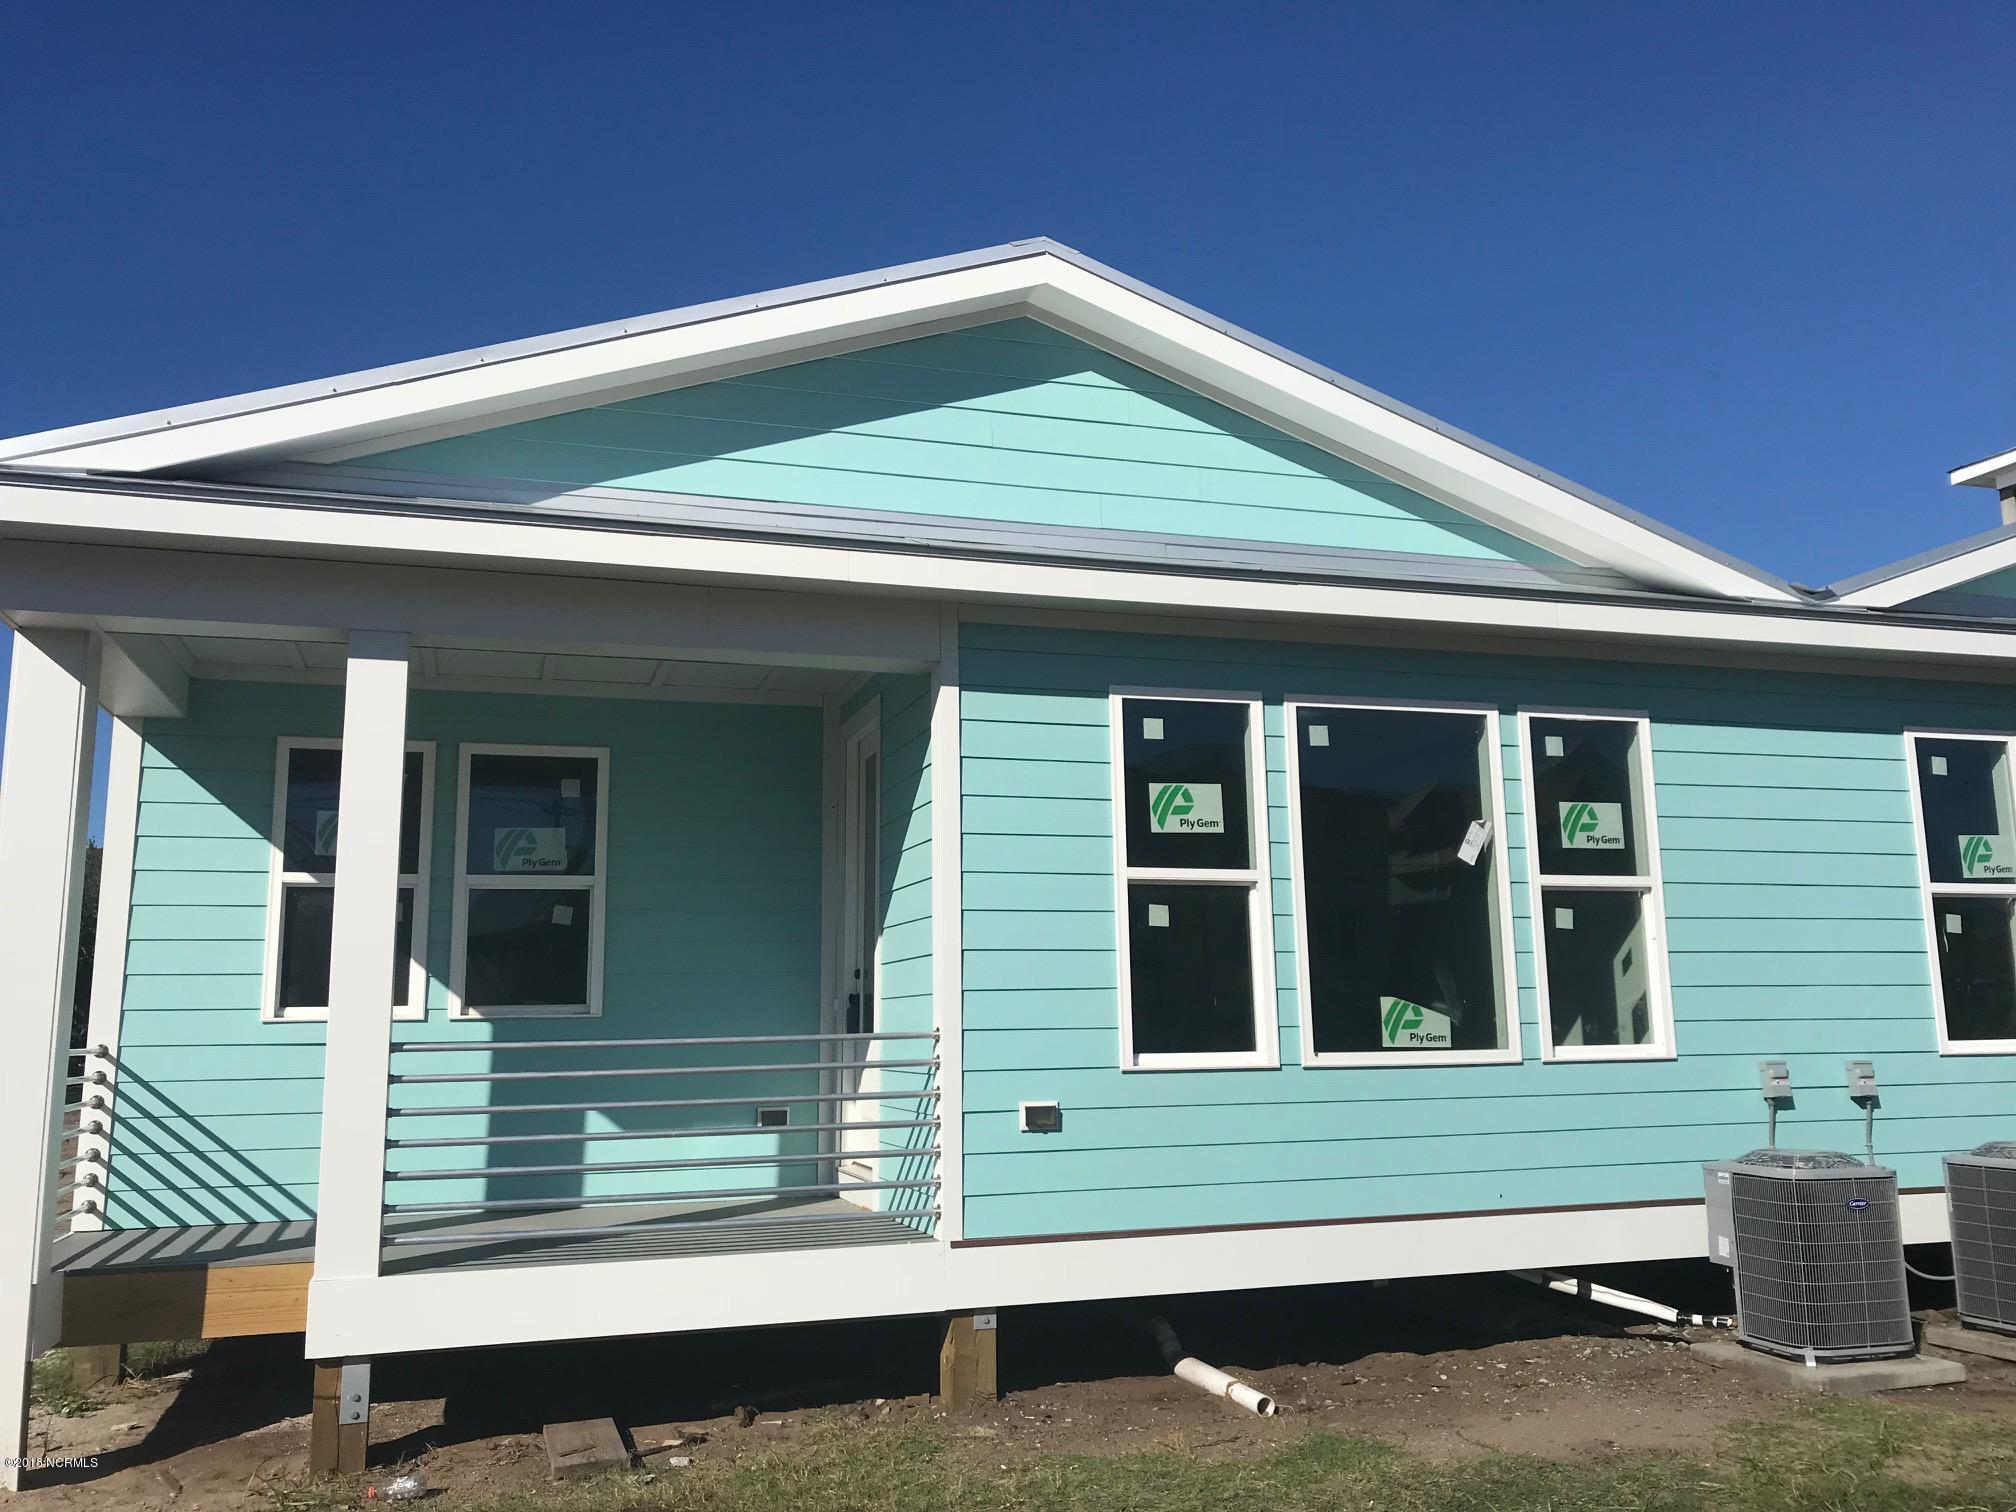 Carolina Plantations Real Estate - MLS Number: 100125625